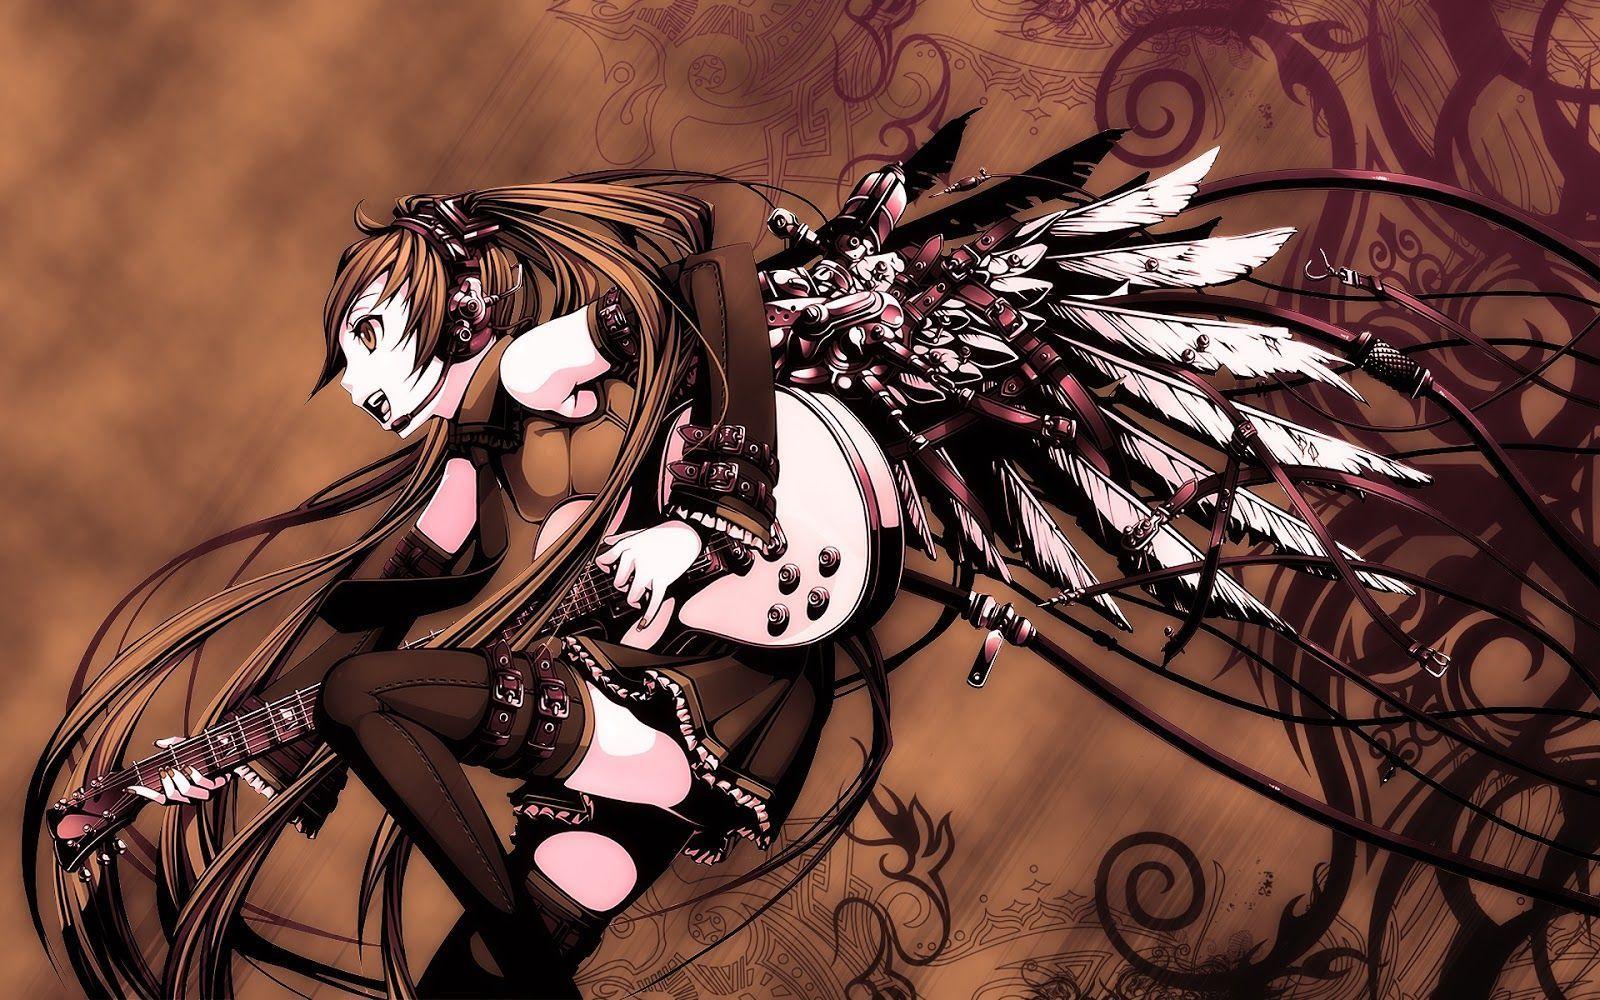 Epic-Anime-1920×1080-Epic-Anime-Adorable-Wallpa-wallpaper-wp3405249